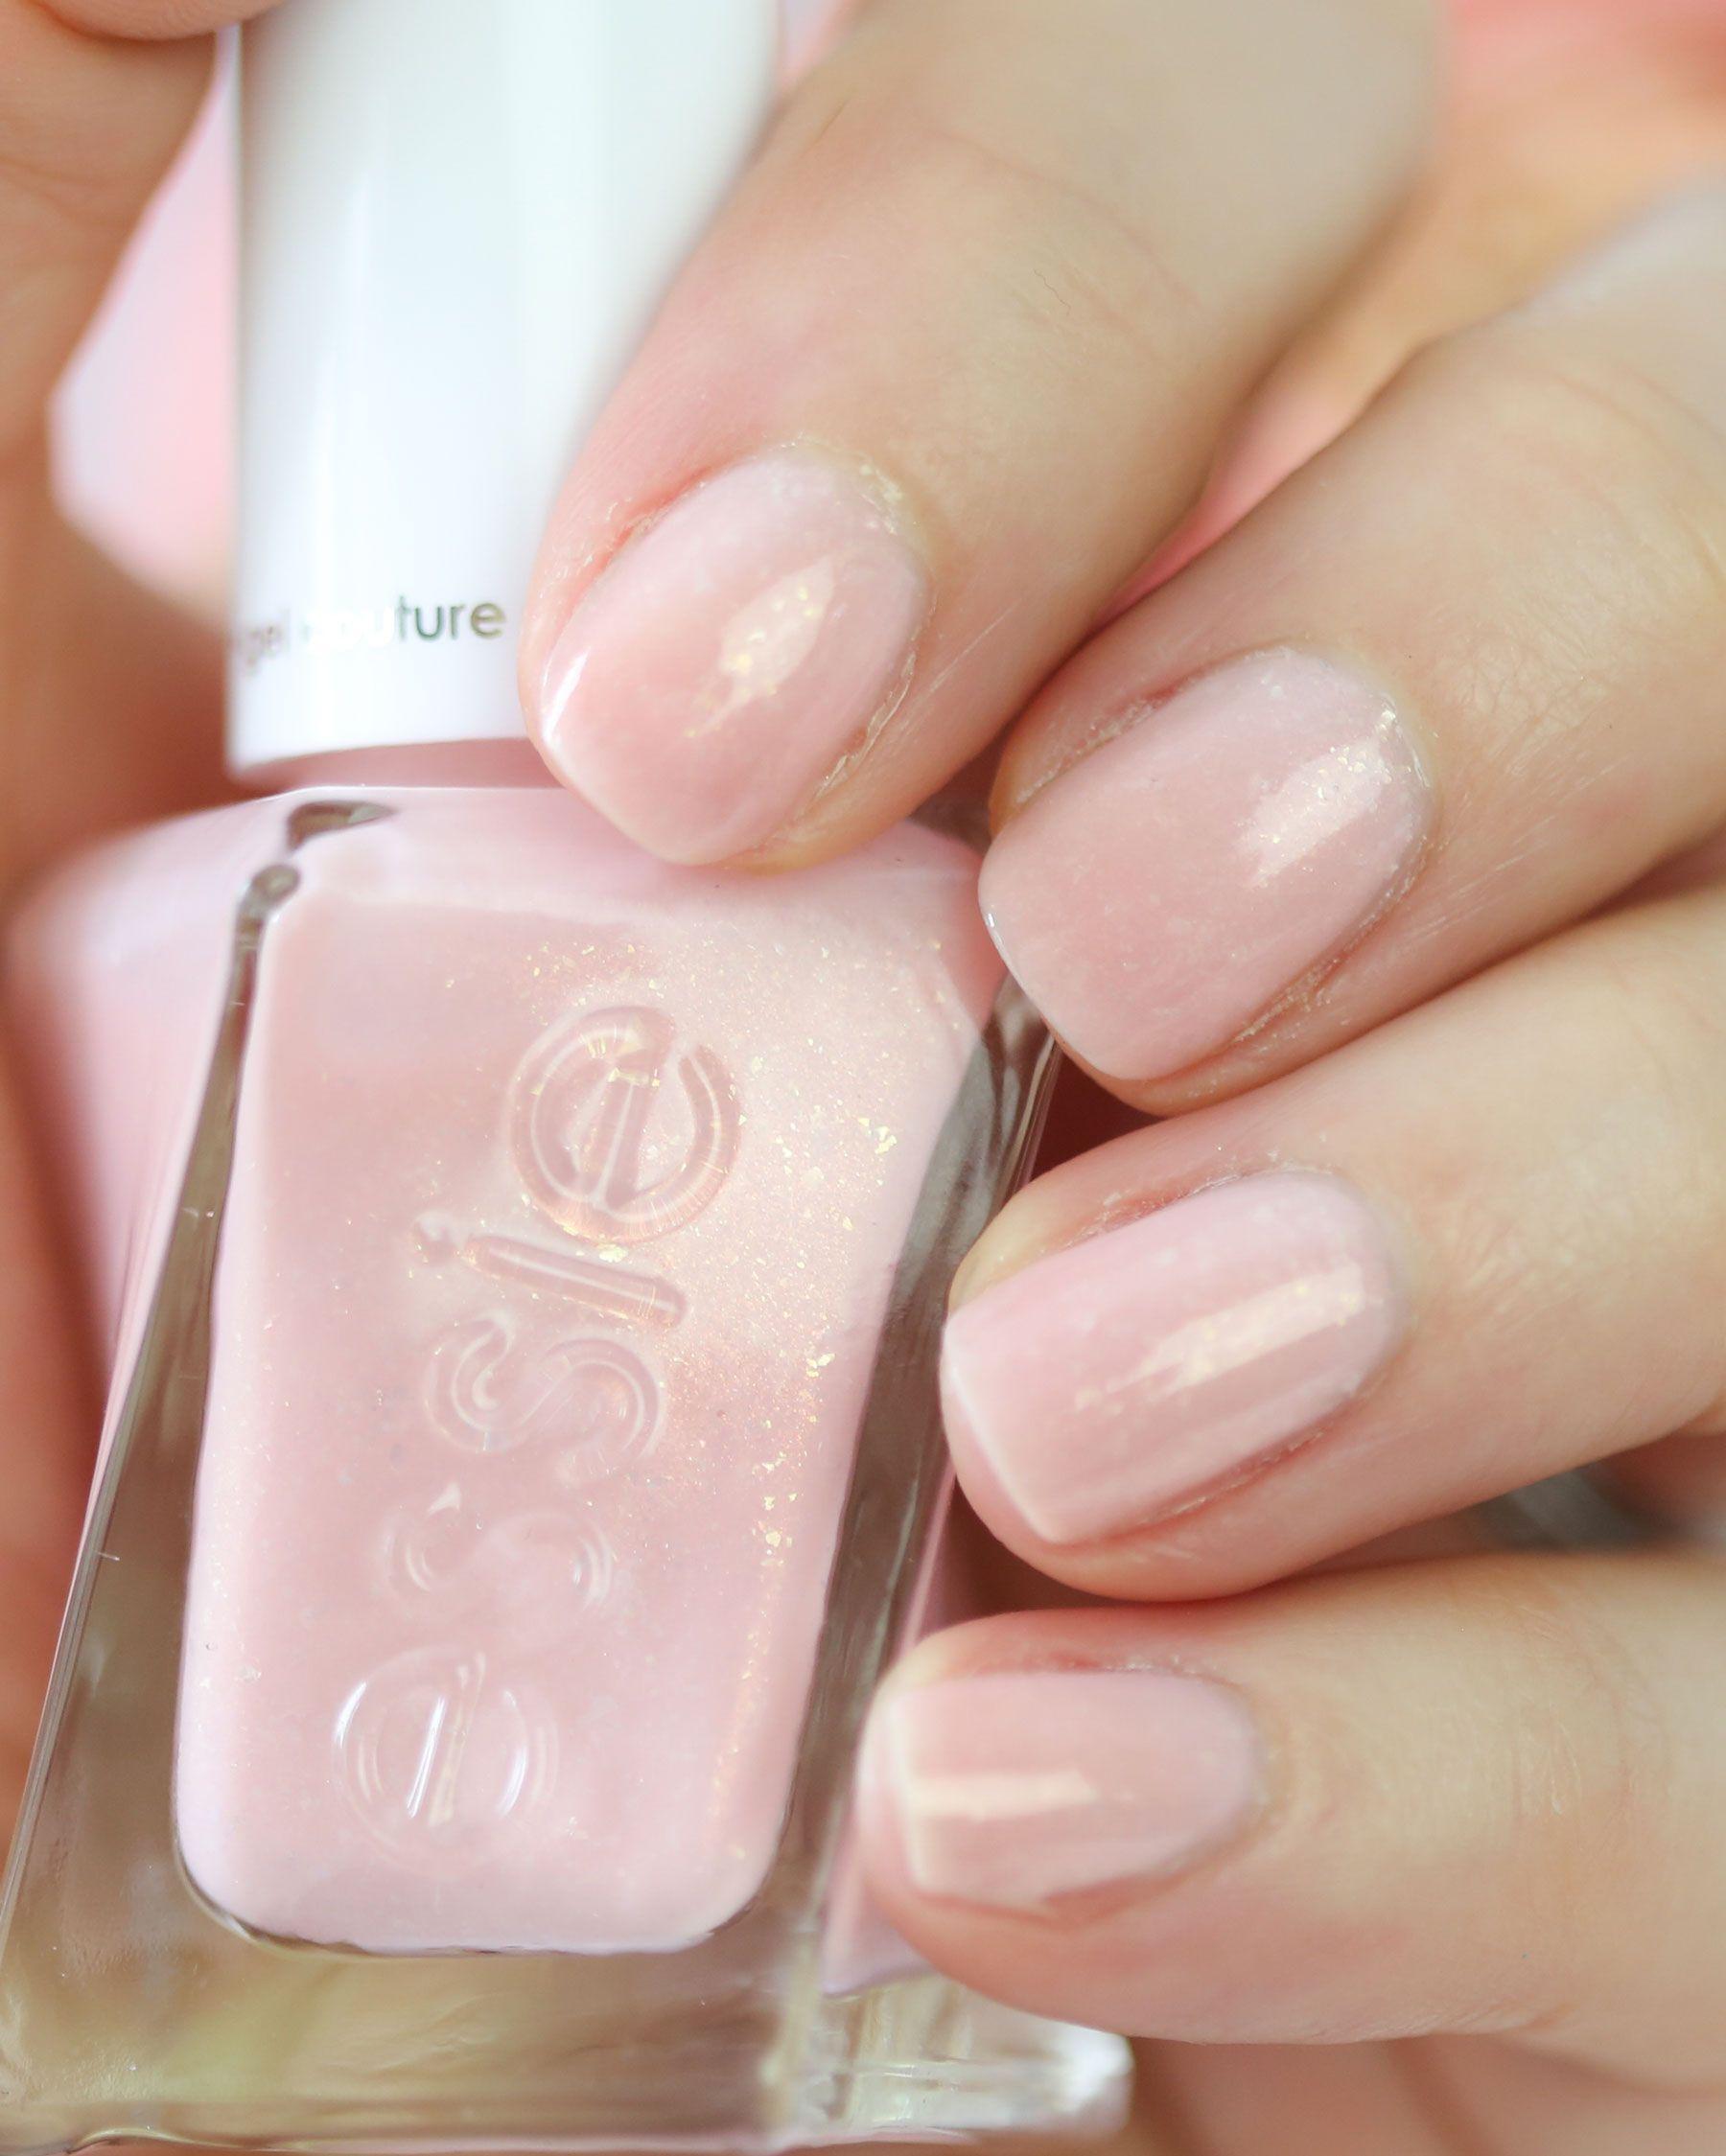 essie gel couture bridal x Monique Lhuillier Blush Worthy | Nails ...